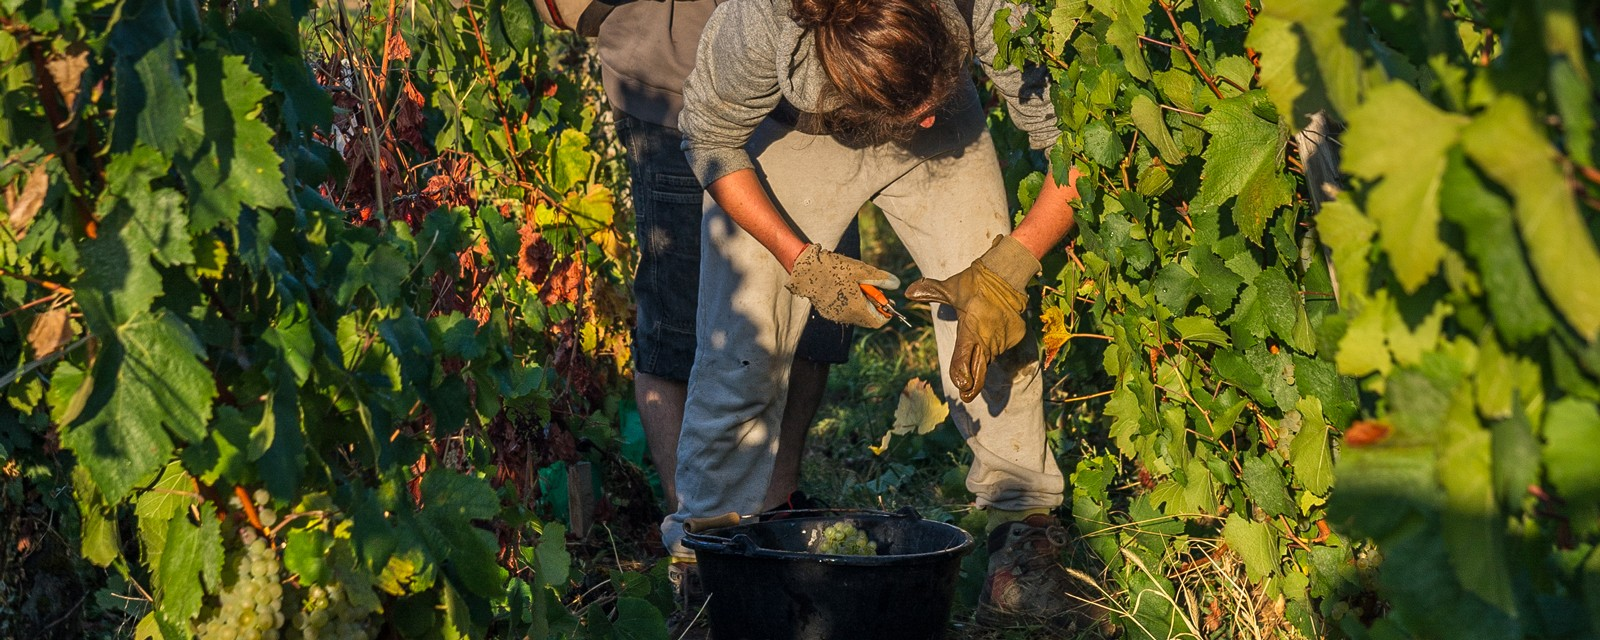 Harvesting in the vineyard